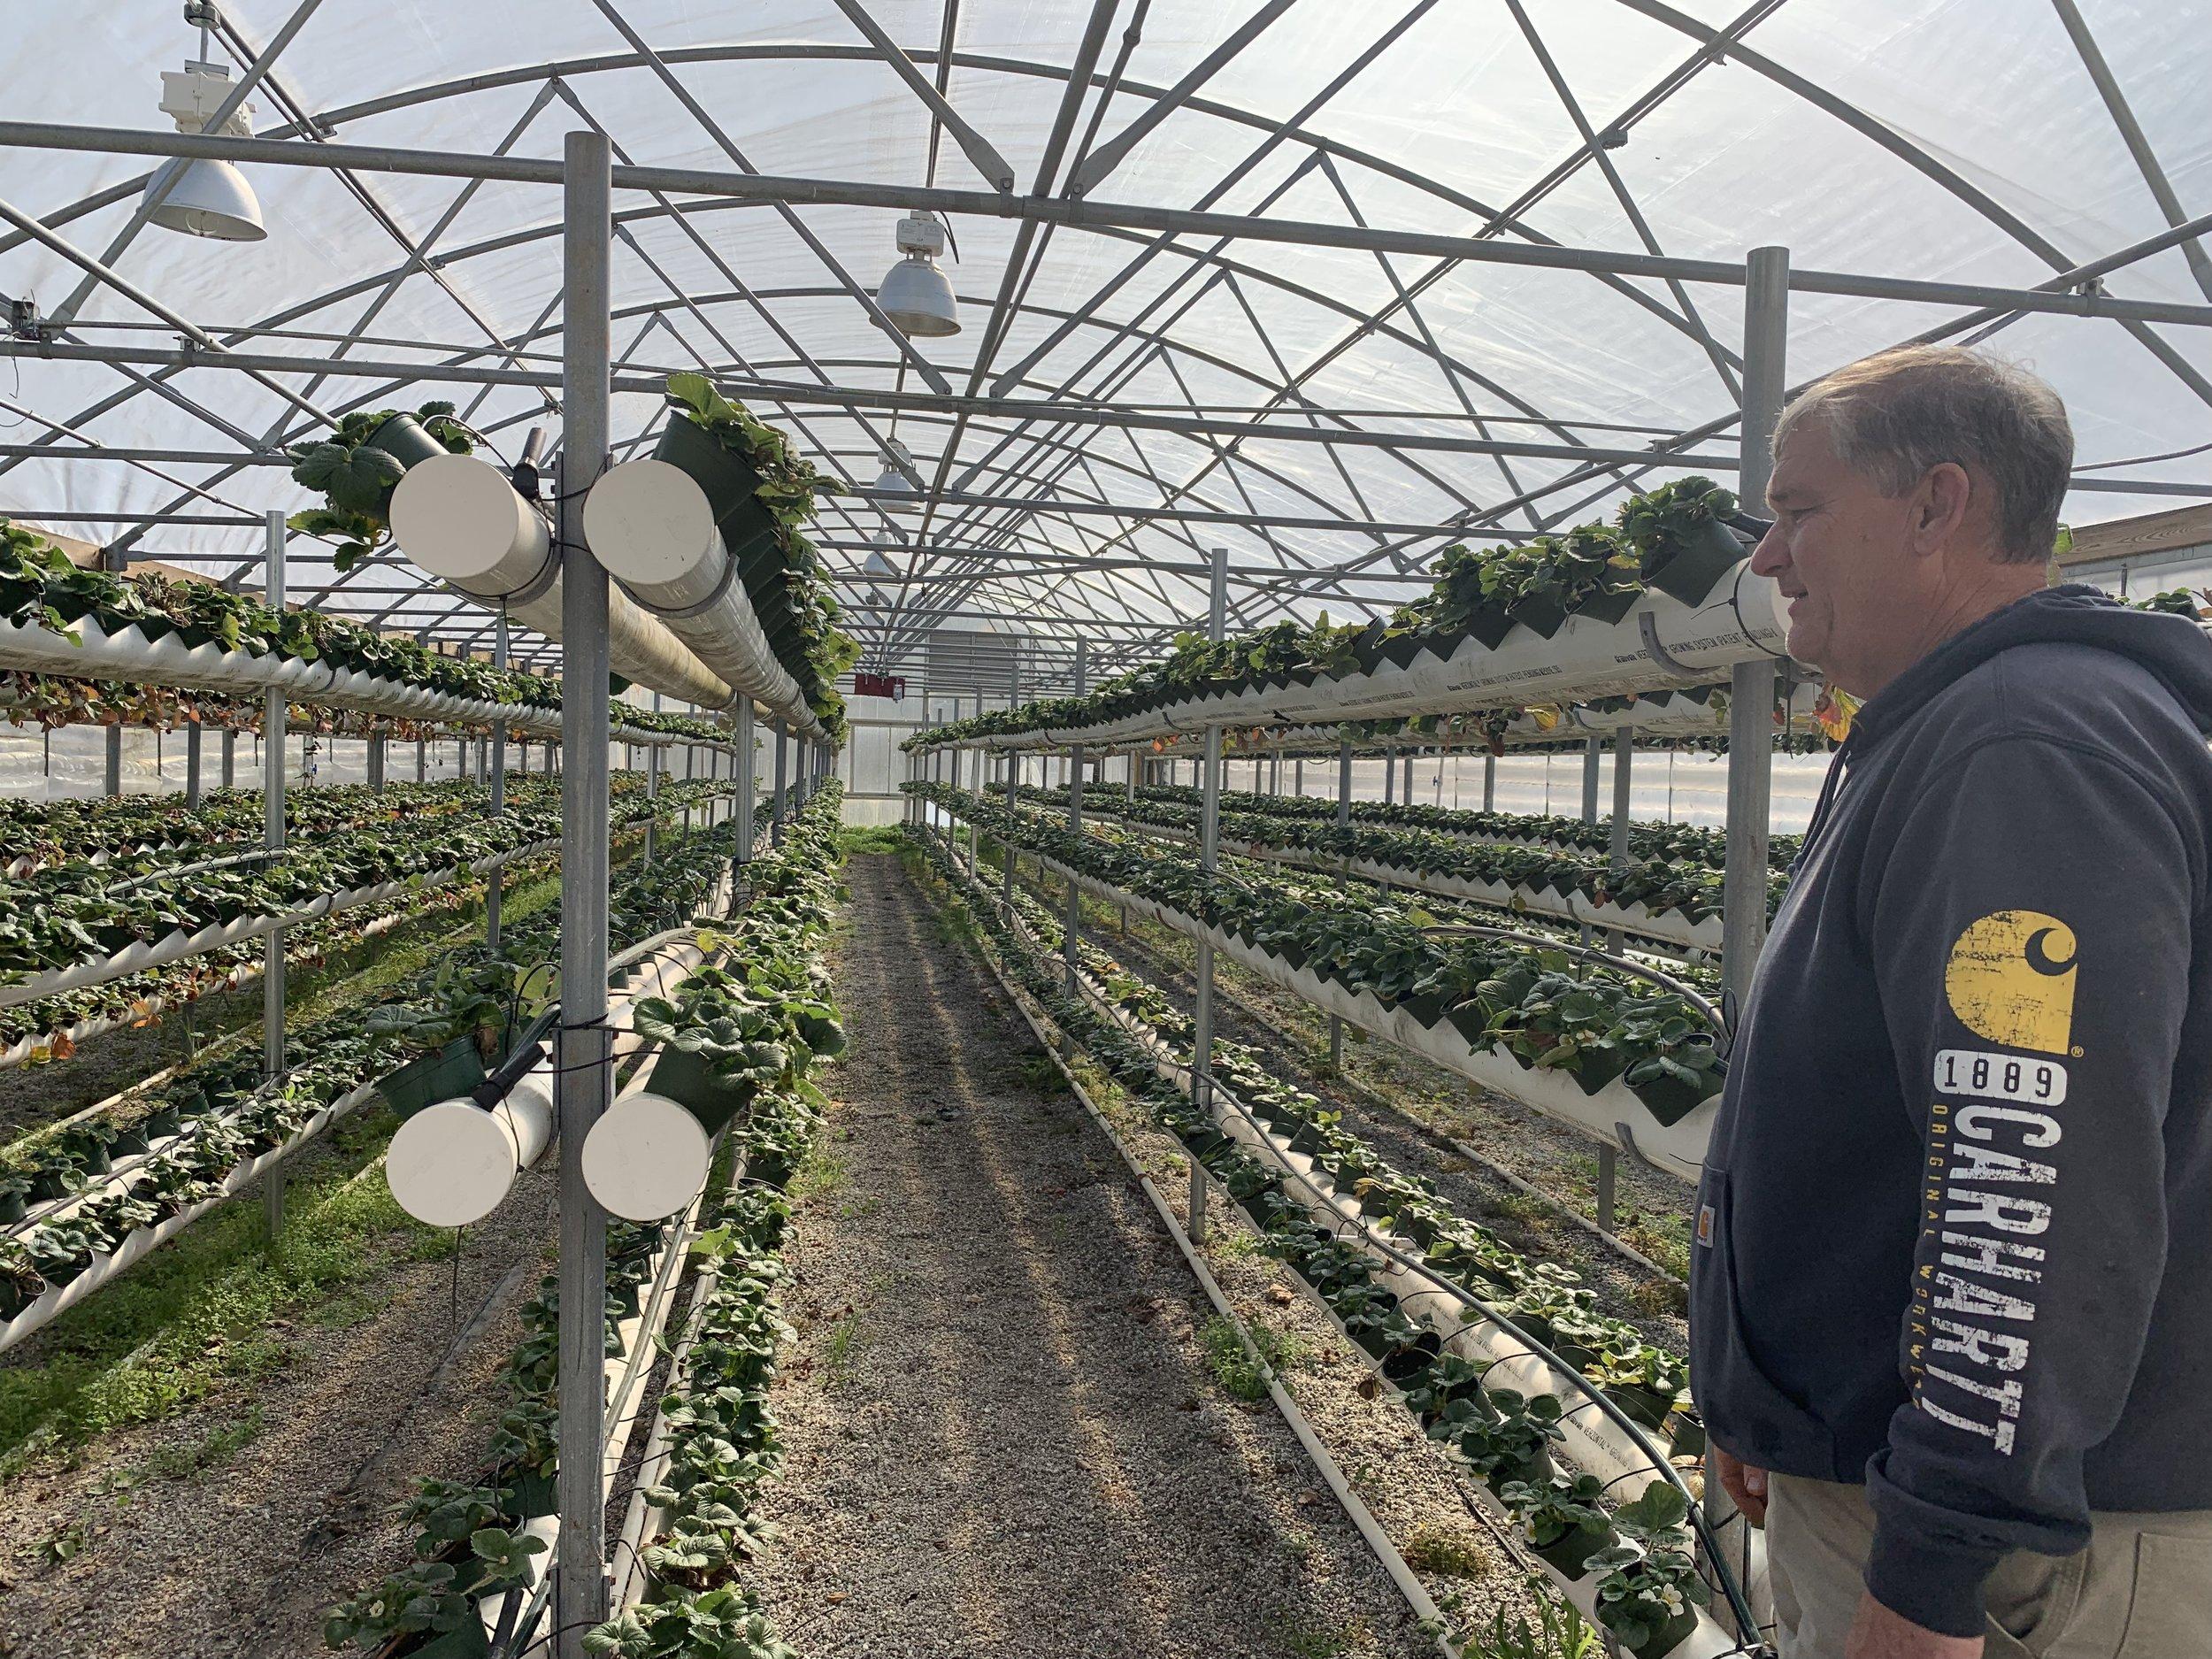 Hurricane Creek Farms in Pelzer, SC — Farm Visit — Jeannie